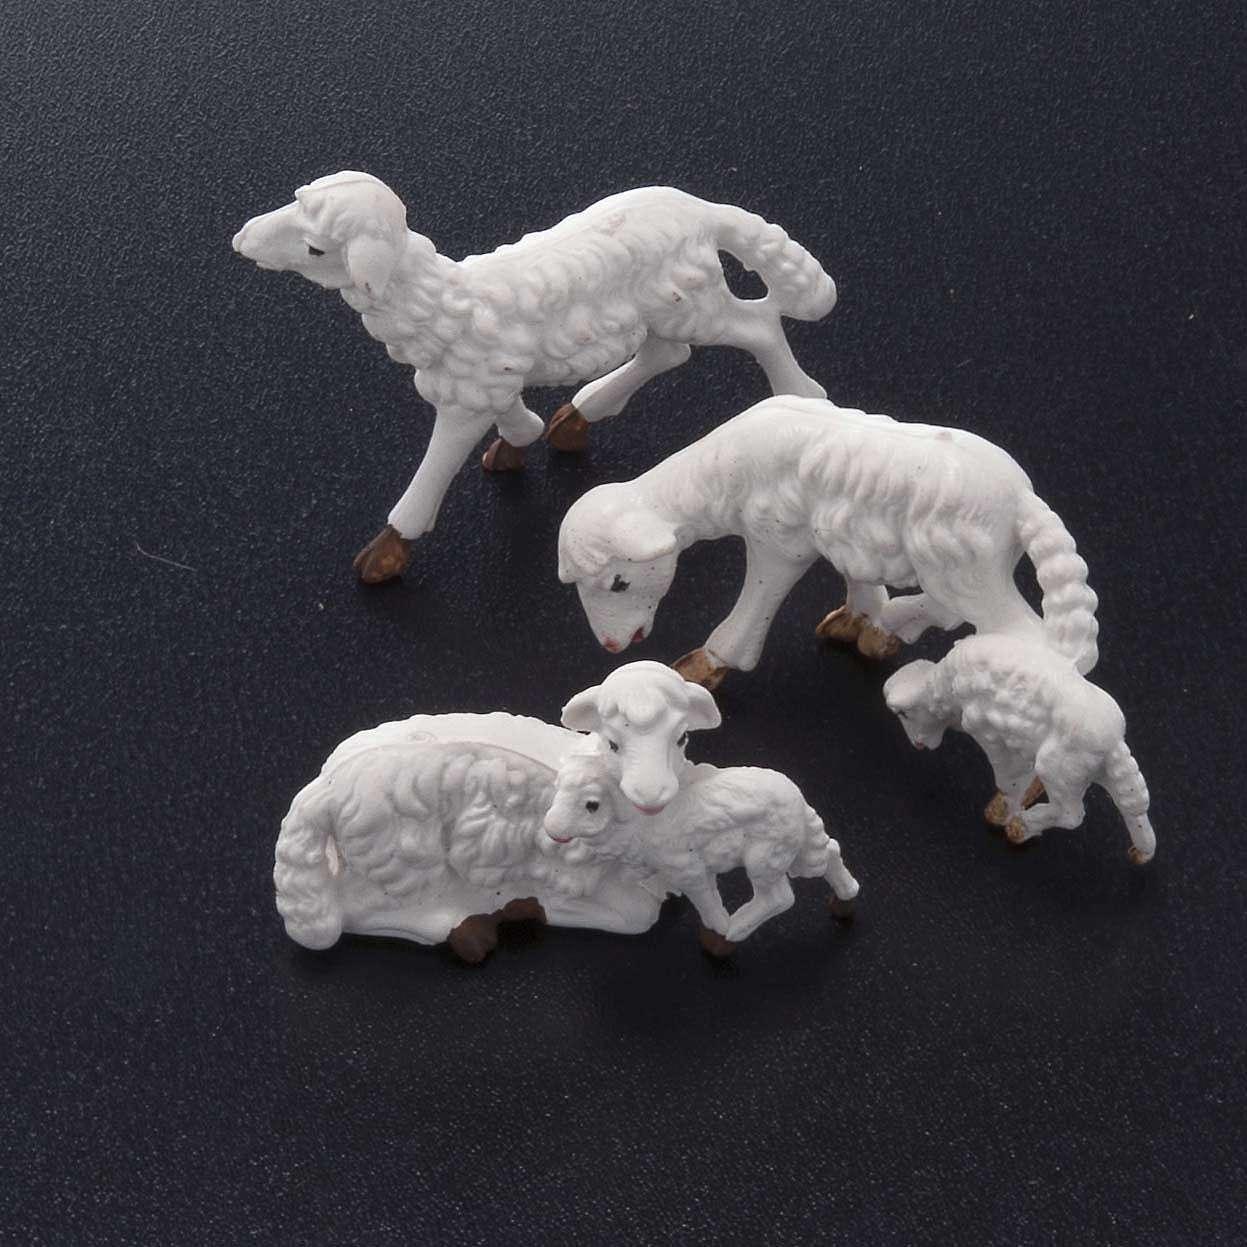 Nativity scene figurines, white sheep 10 pieces 10 cm 3